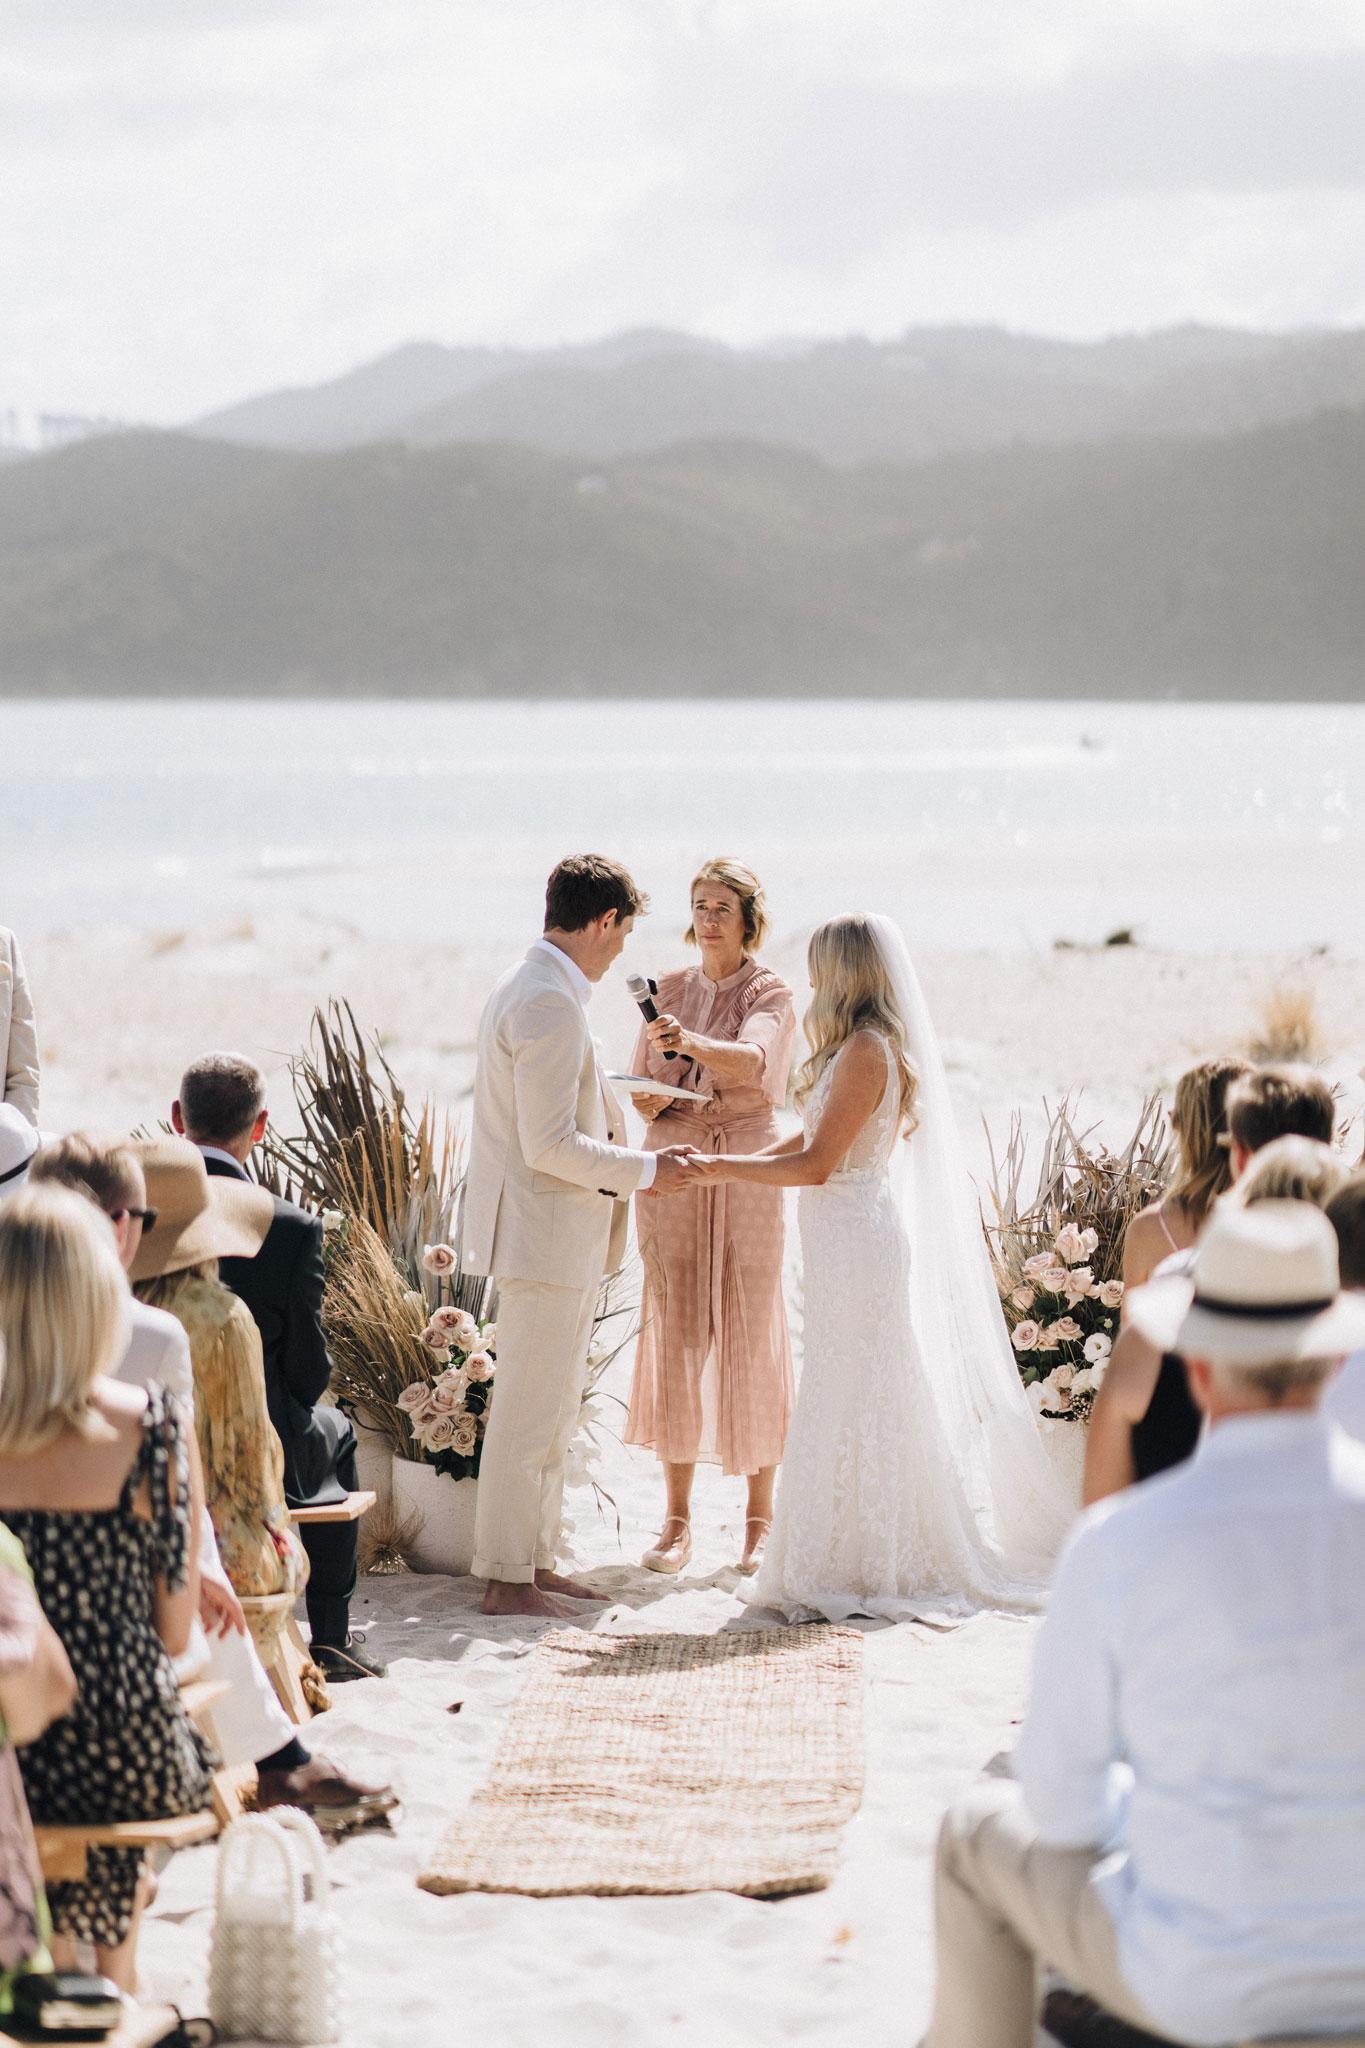 newfound-k-b-coromandel-wedding-photographers-056